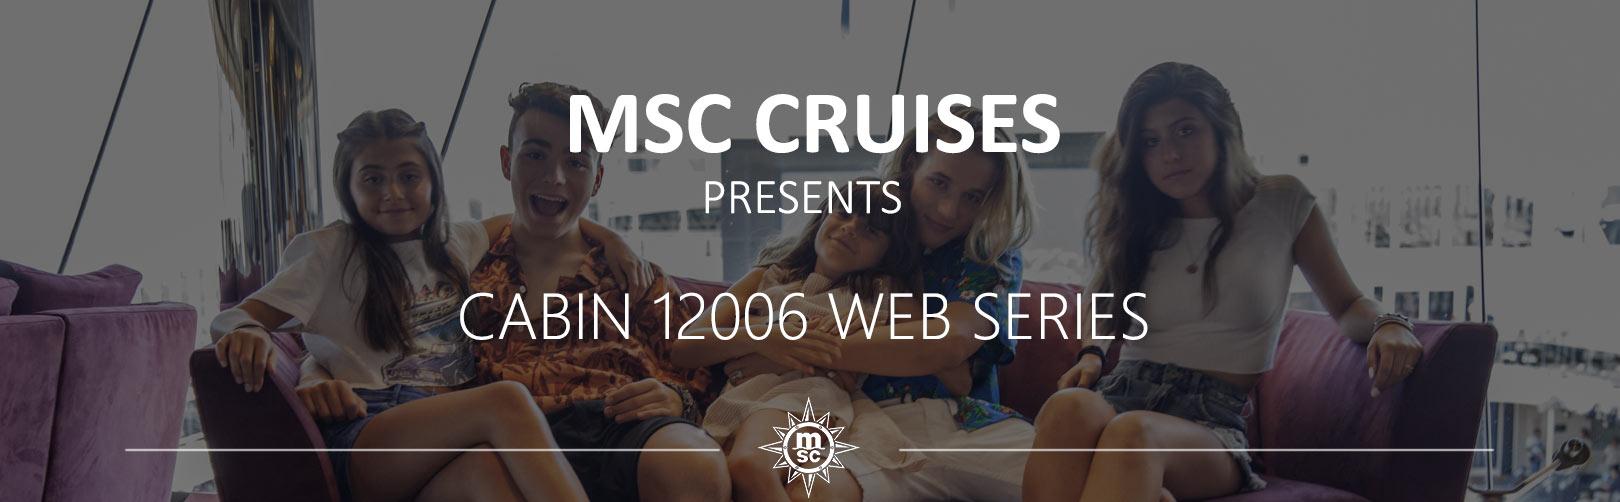 Msc-cruises-presents-cabin12006-web-series